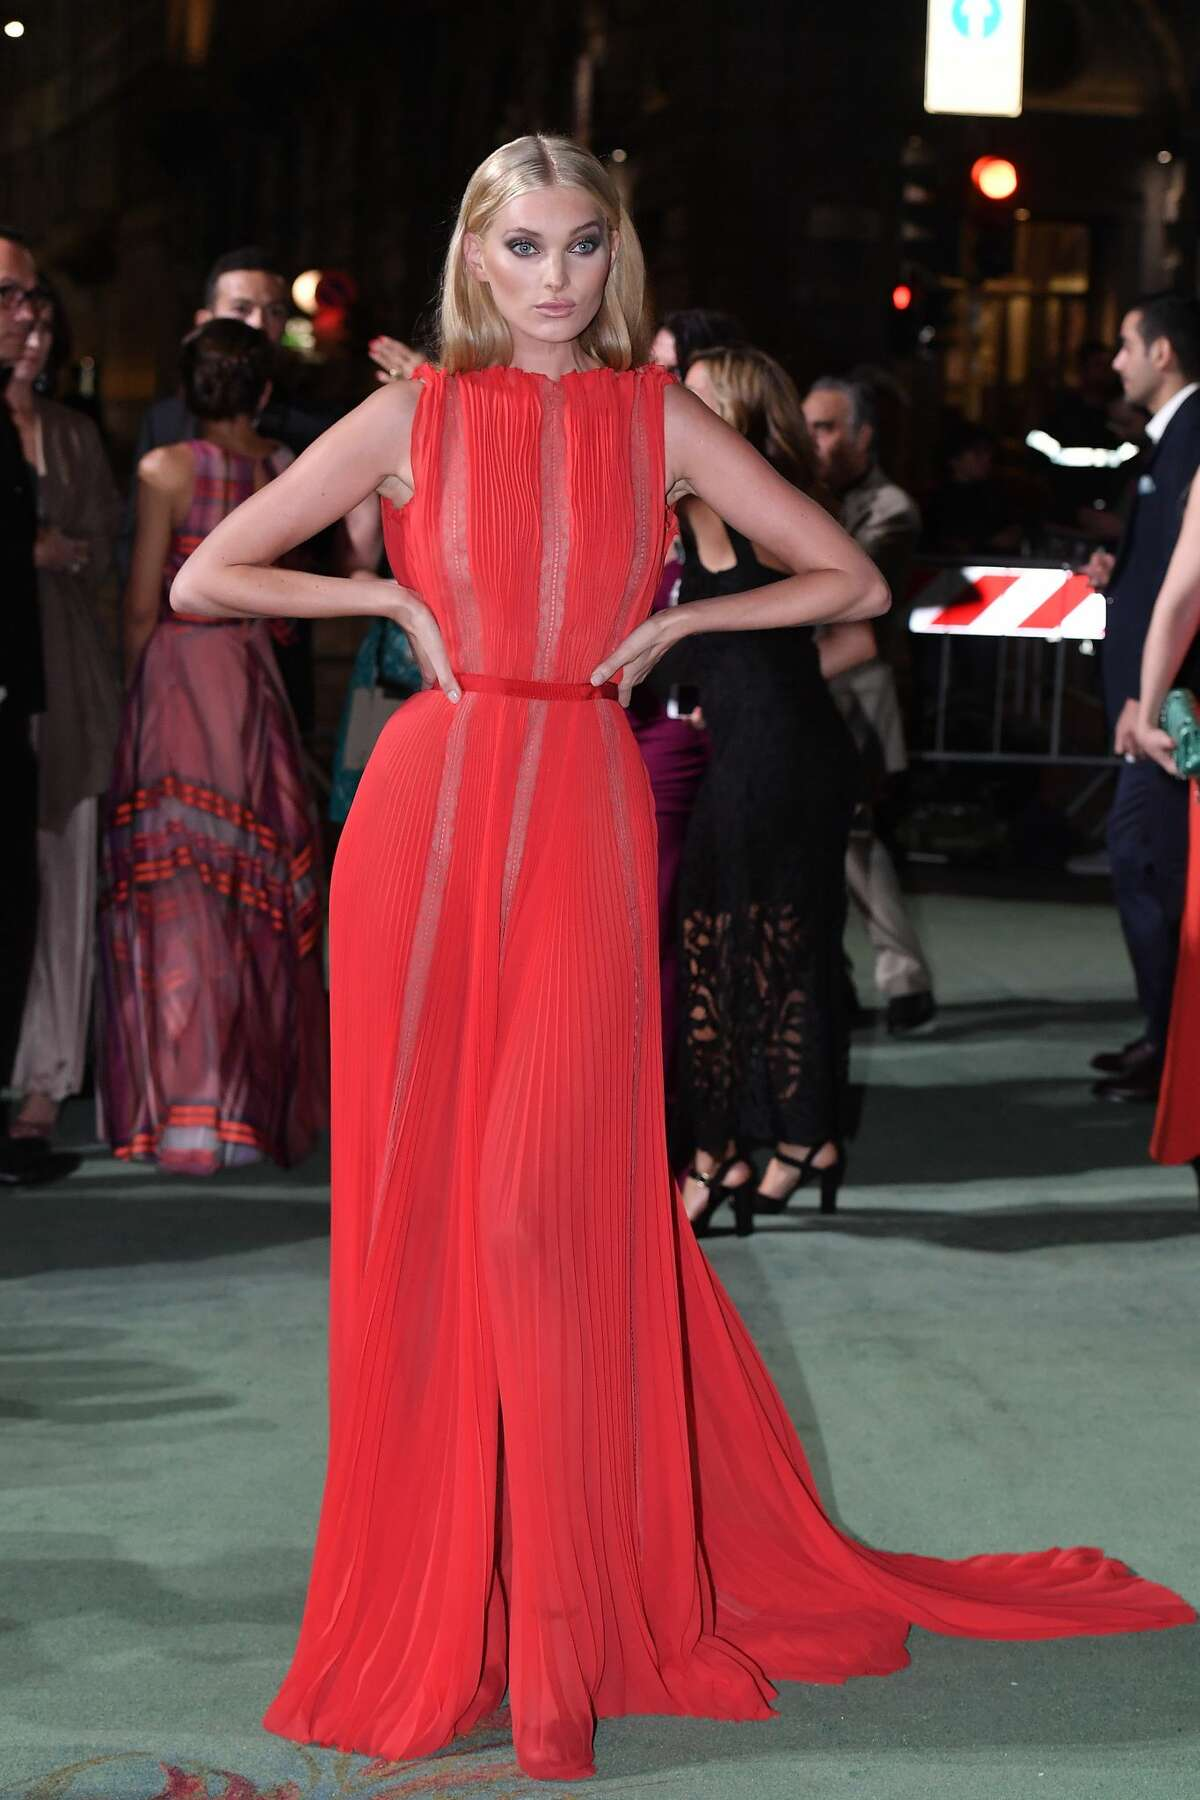 Elsa Hosk attends the Green Carpet Fashion Awards Italia 2017 during Milan Fashion Week Spring/Summer 2018 on September 24, 2017.